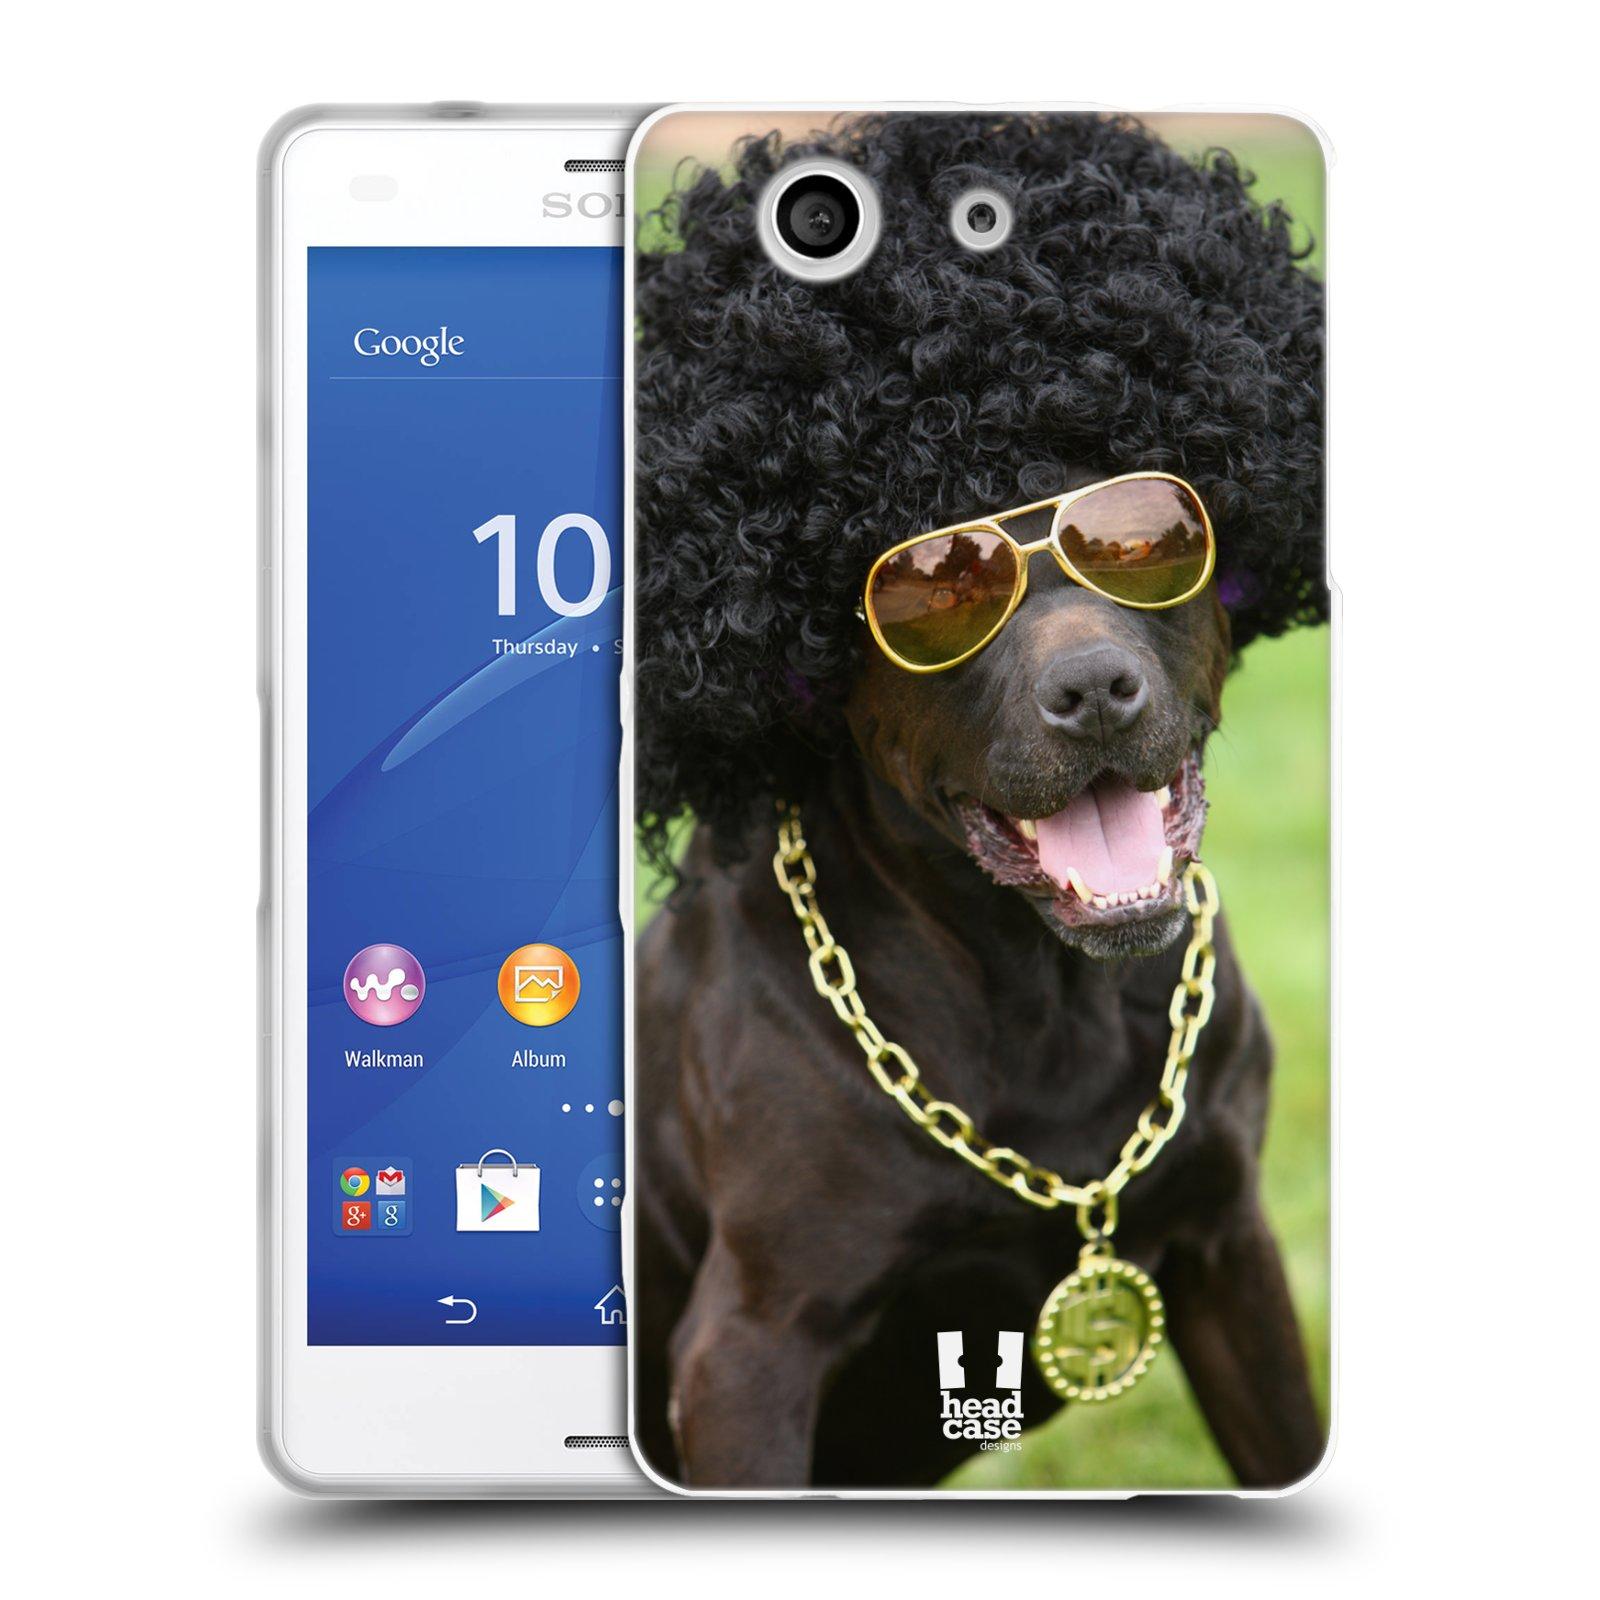 HEAD CASE silikonový obal na mobil Sony Xperia Z3 COMPACT (D5803) vzor Legrační zvířátka pejsek boháč